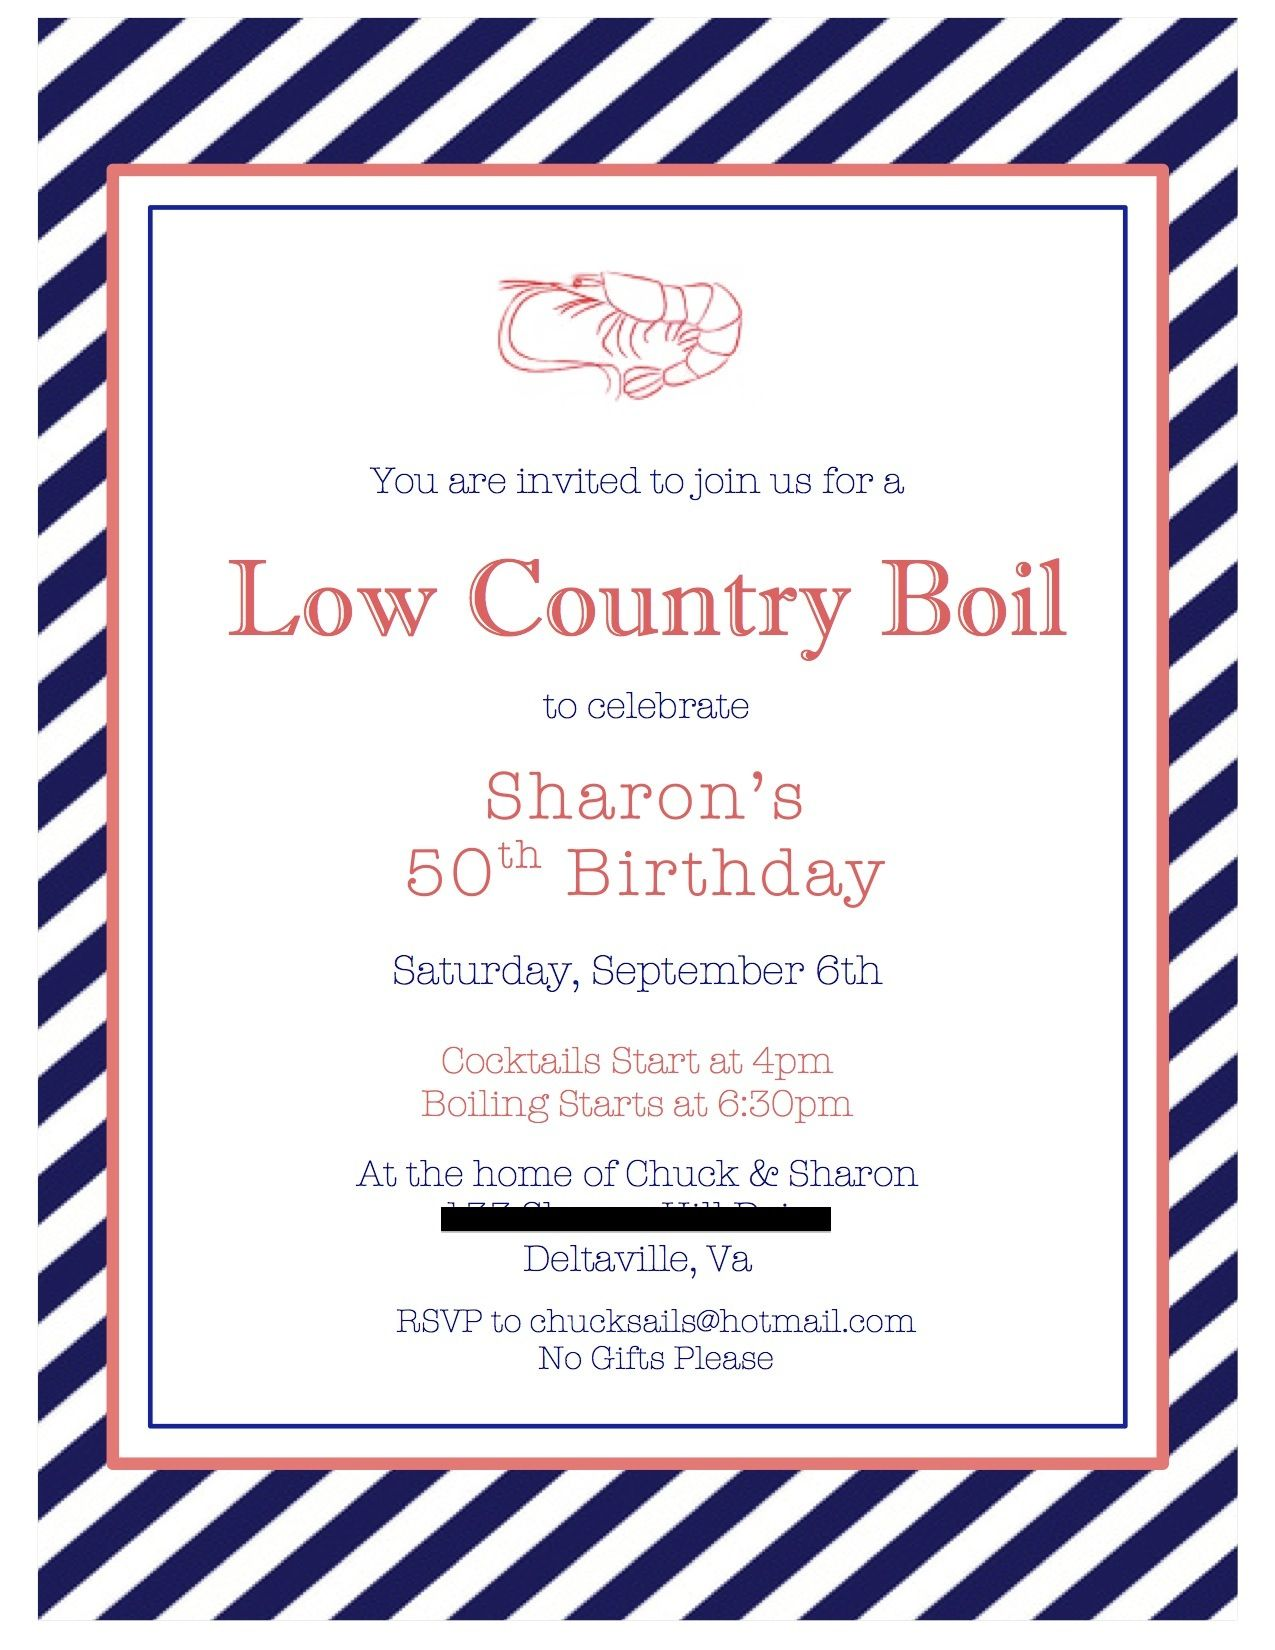 Low Country Boil 50th Birthday Invitation 50th birthday